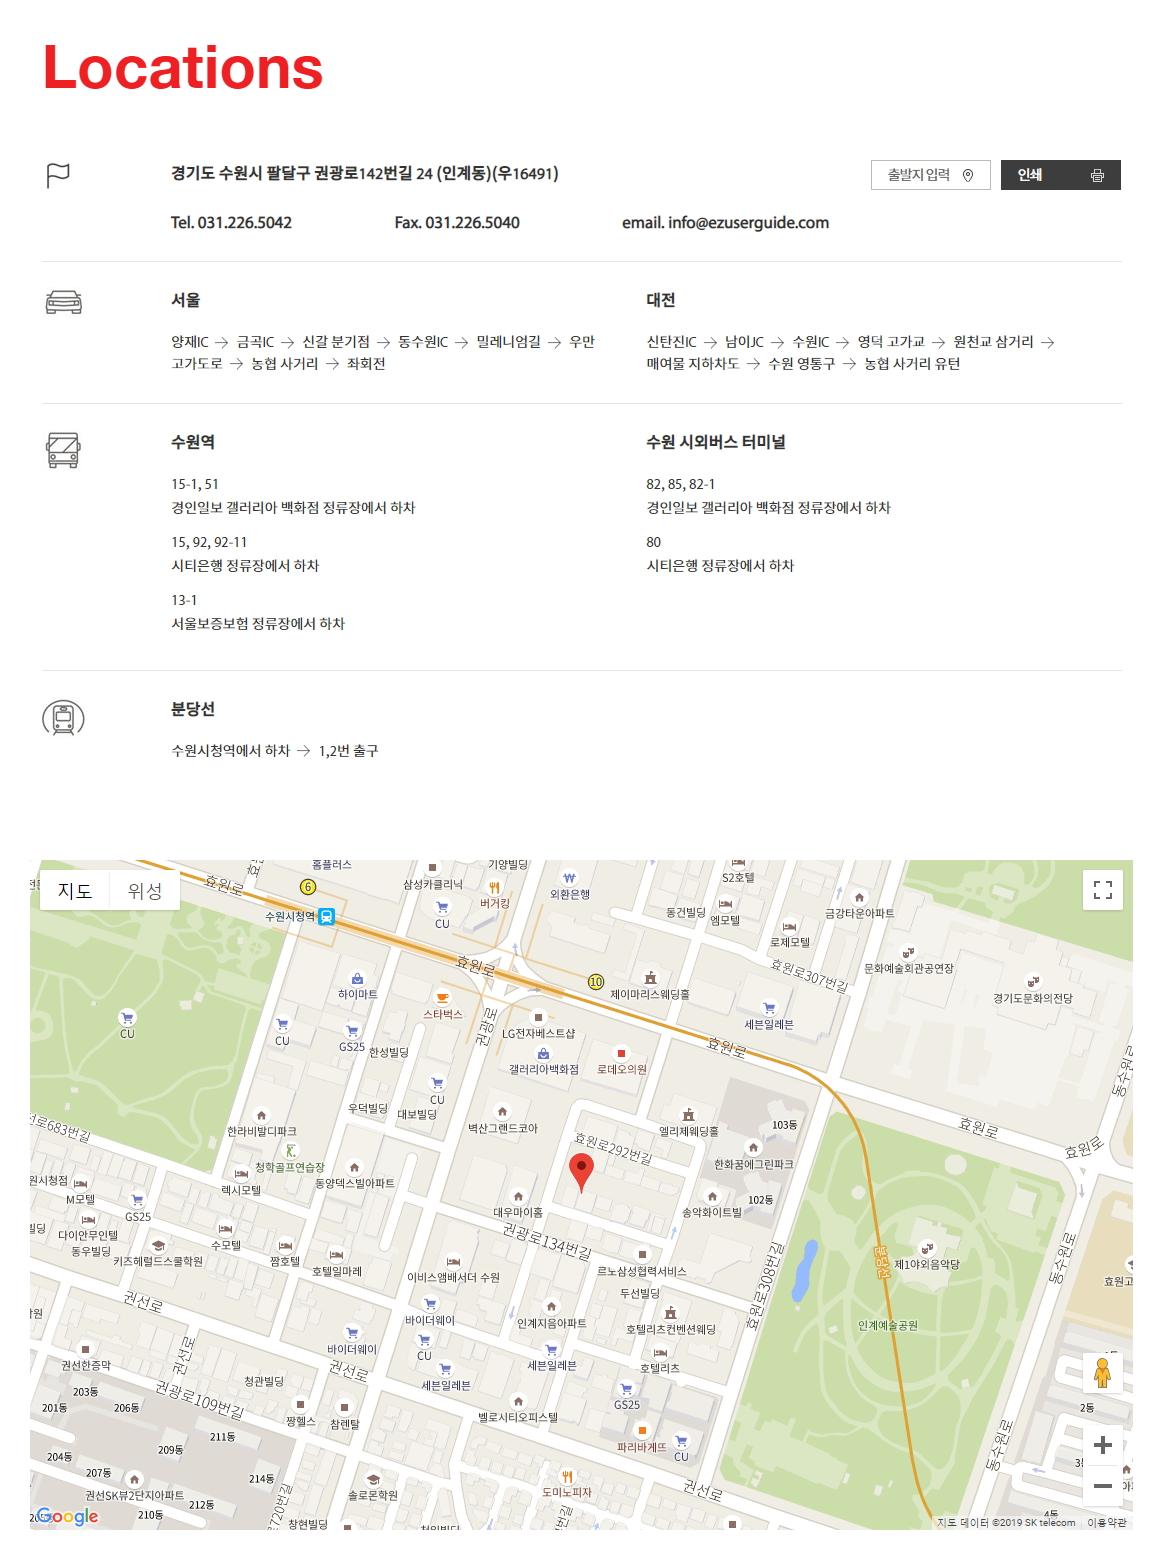 location print image